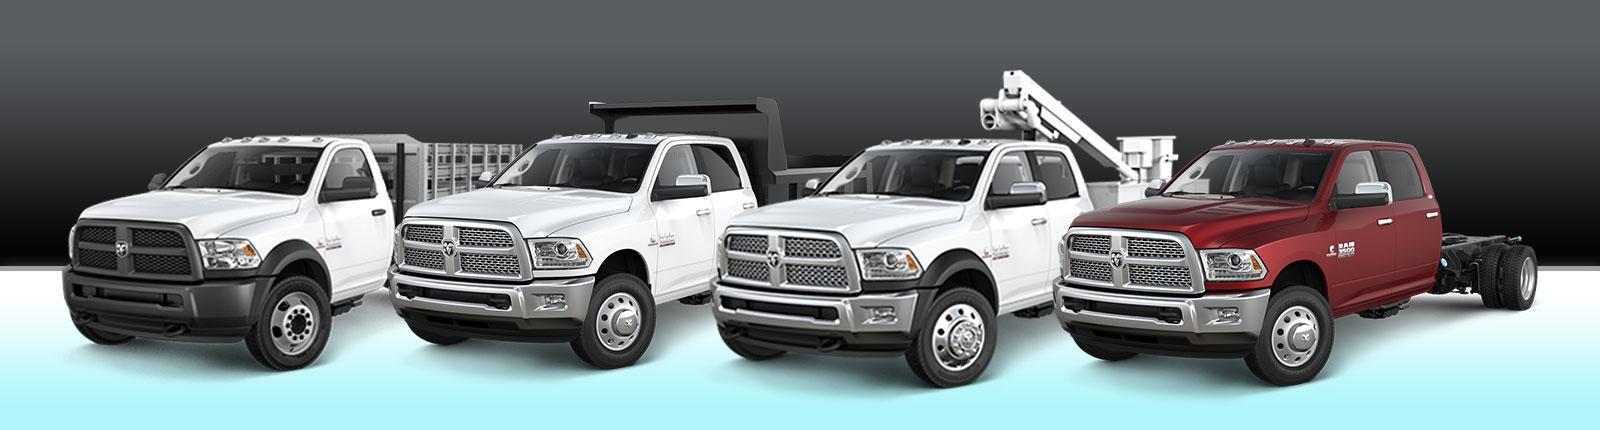 cc3999e9f7 About Commercial Vehicles